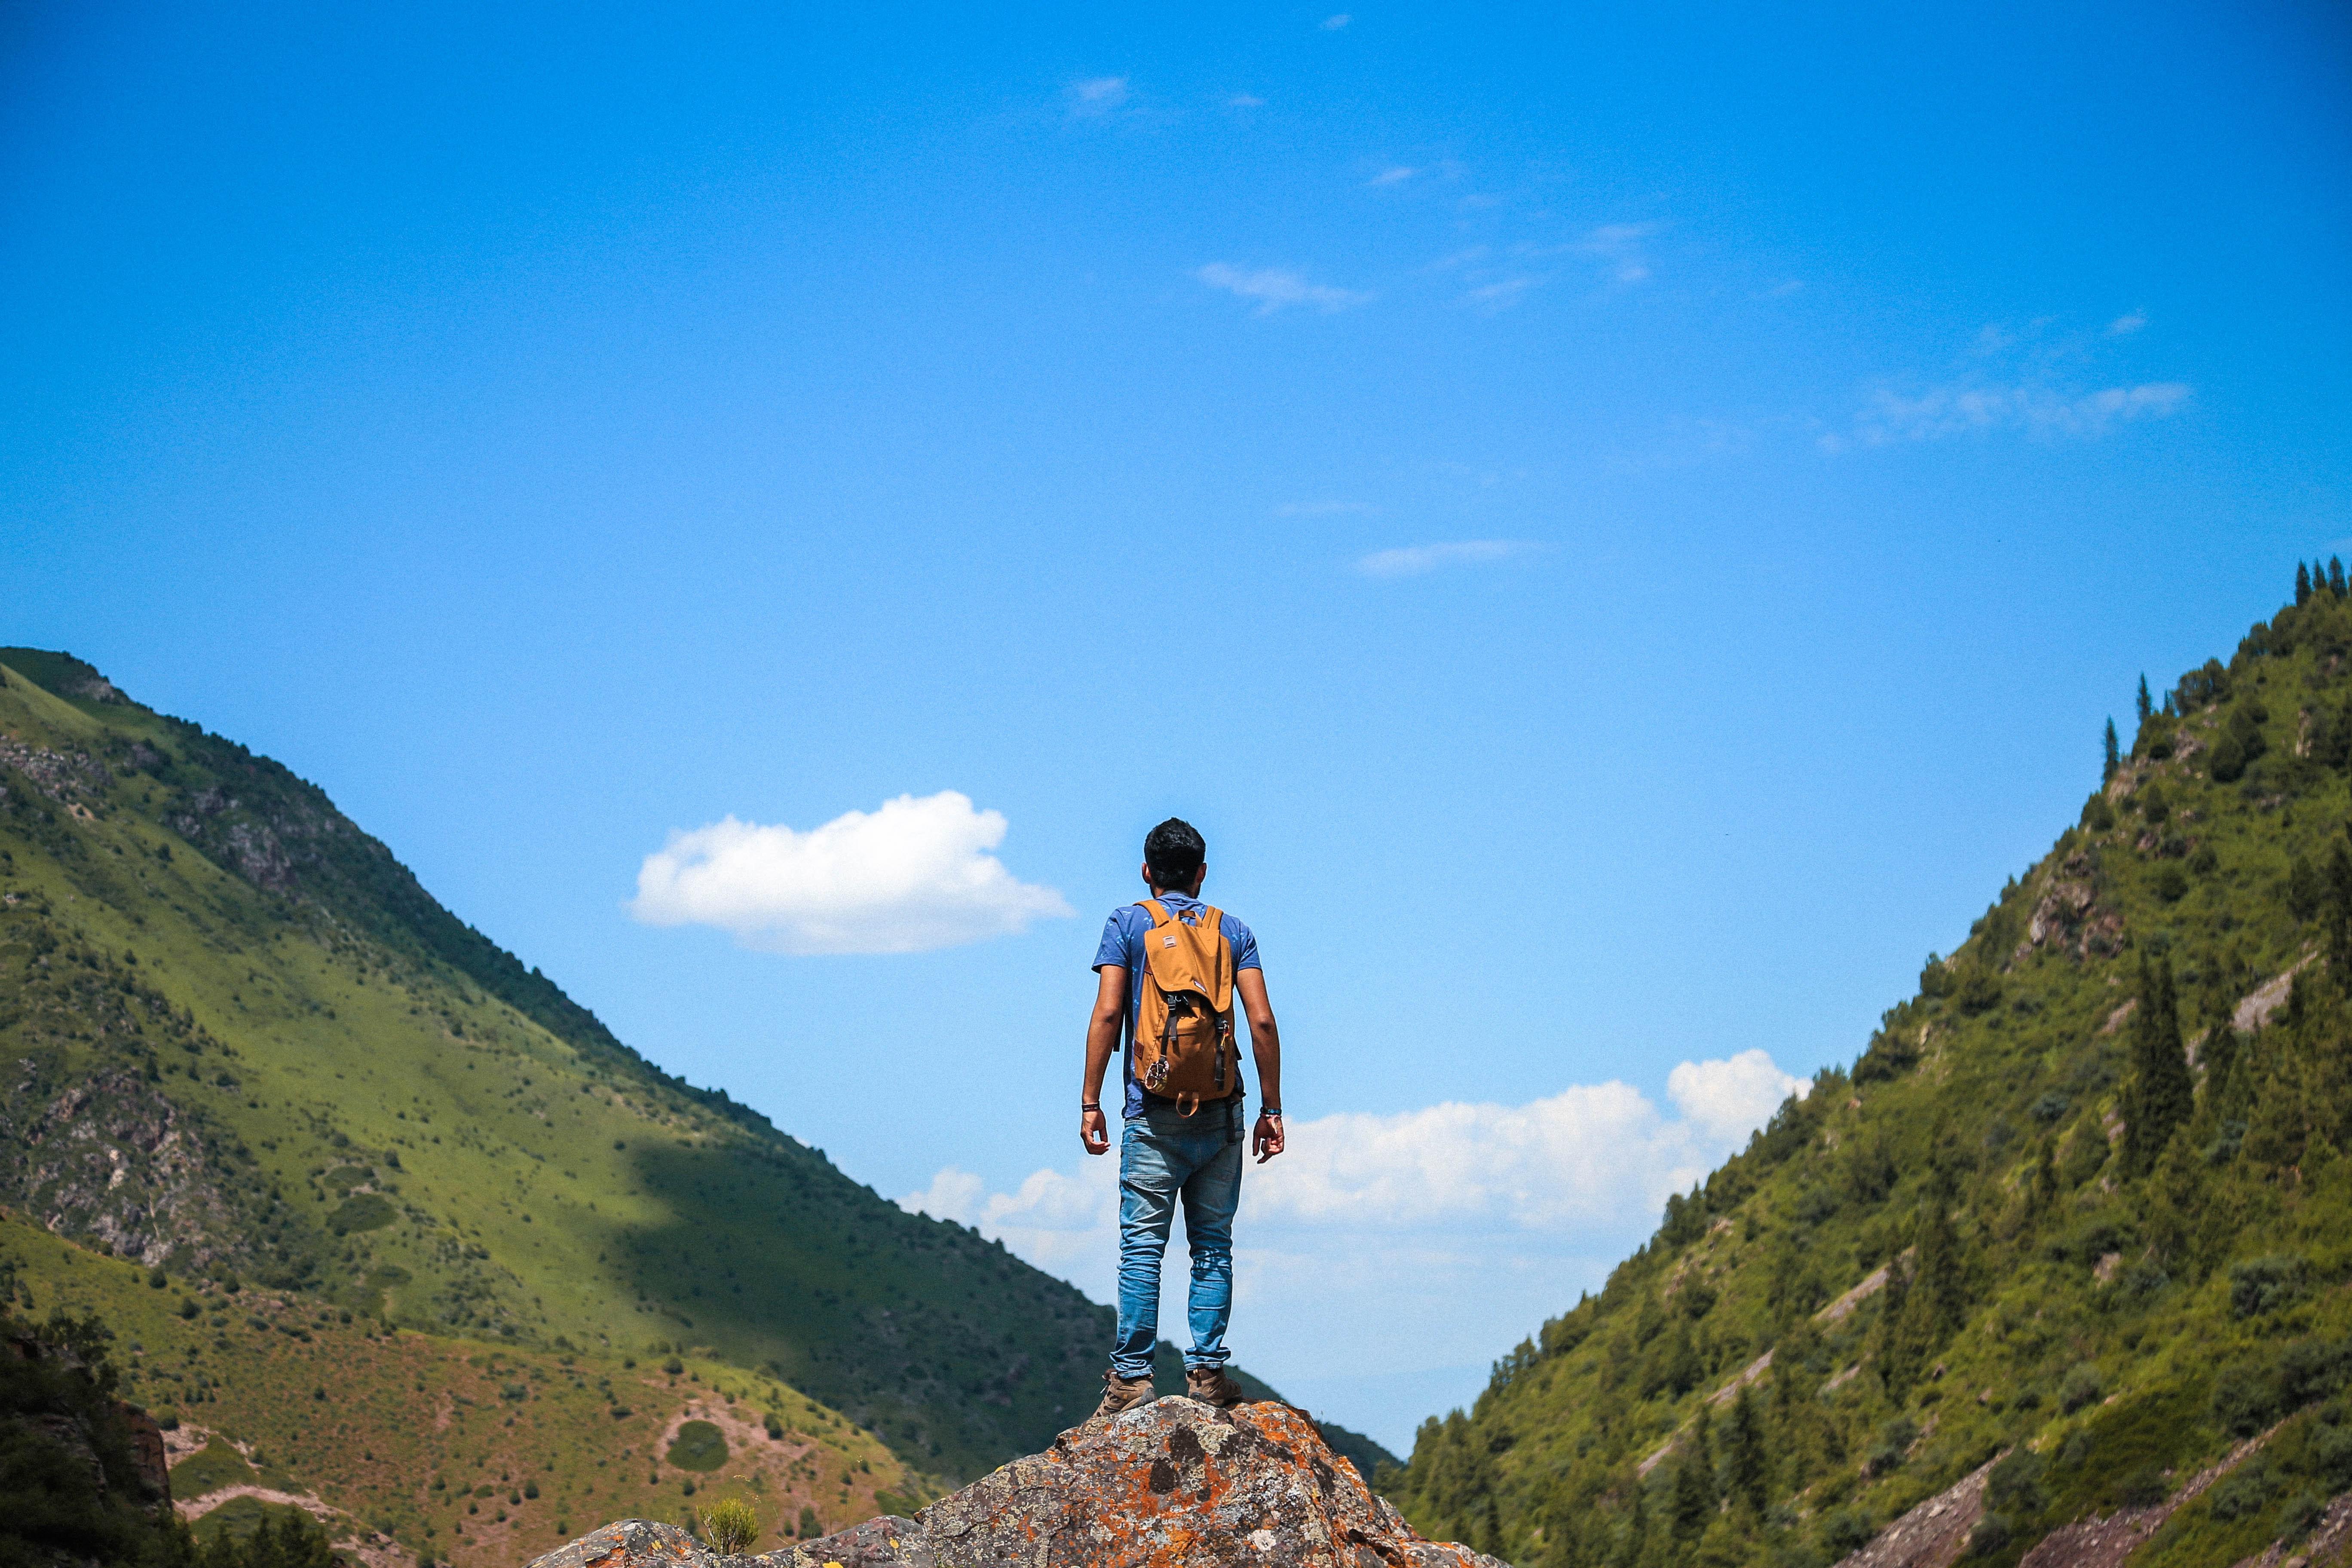 Man on top of mountain photo